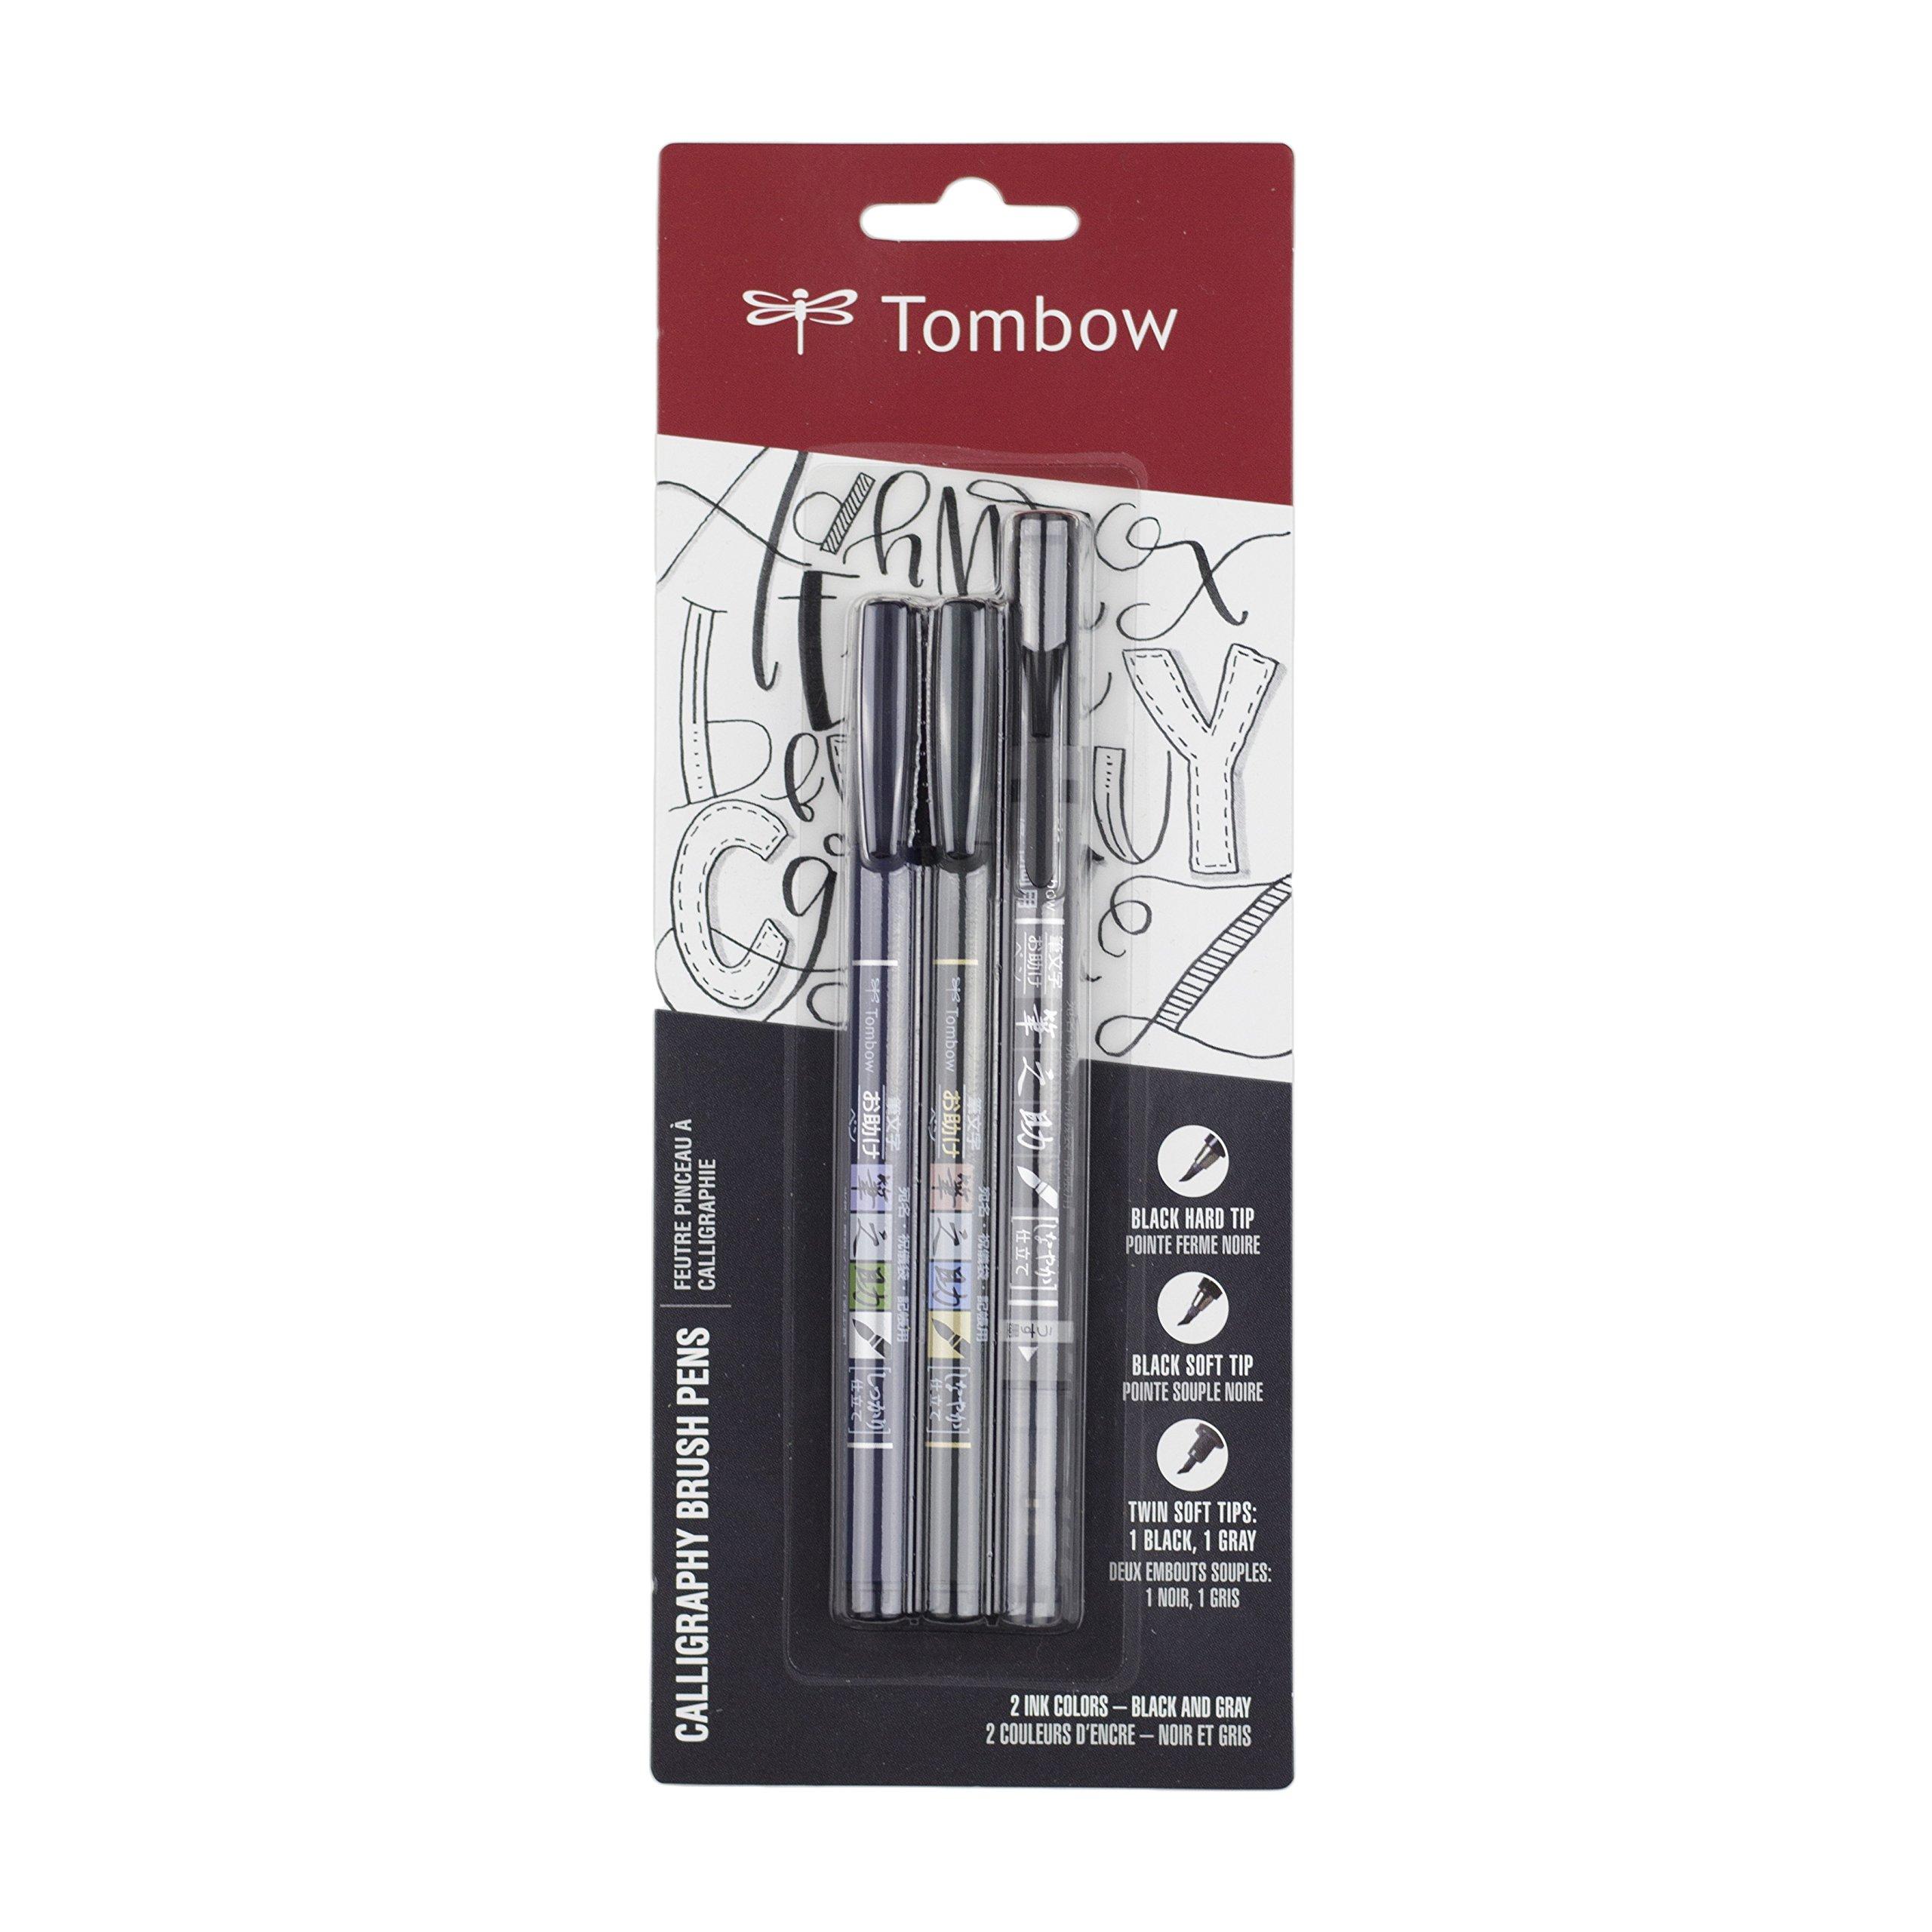 Tombow 62039 Fudenosuke Pen, 3-Pack, Black/Grey